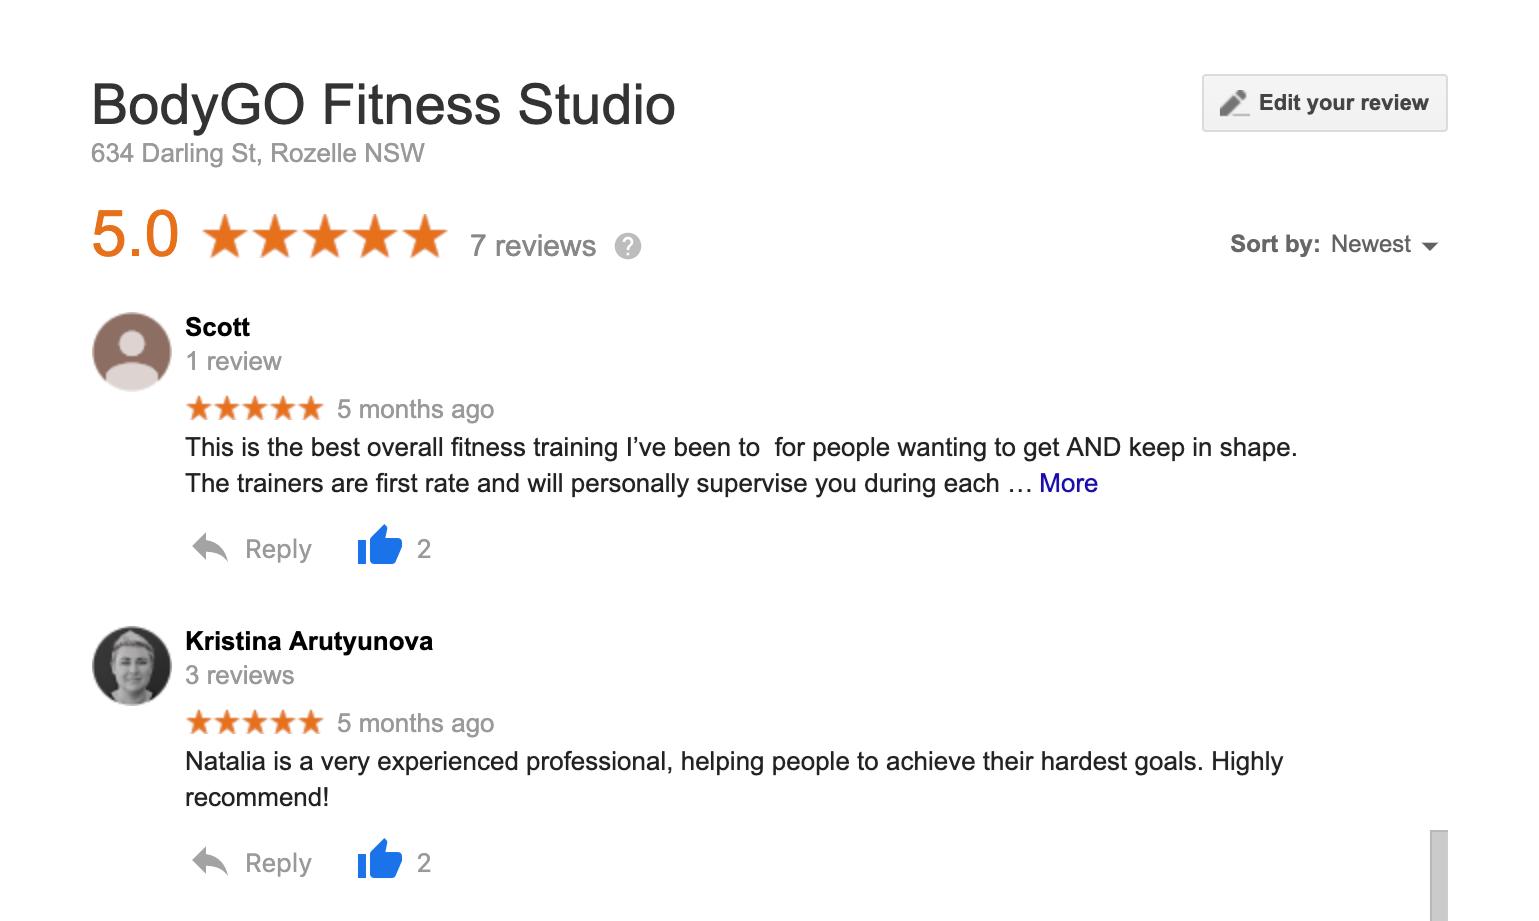 Google reviews: Scott & Kristina